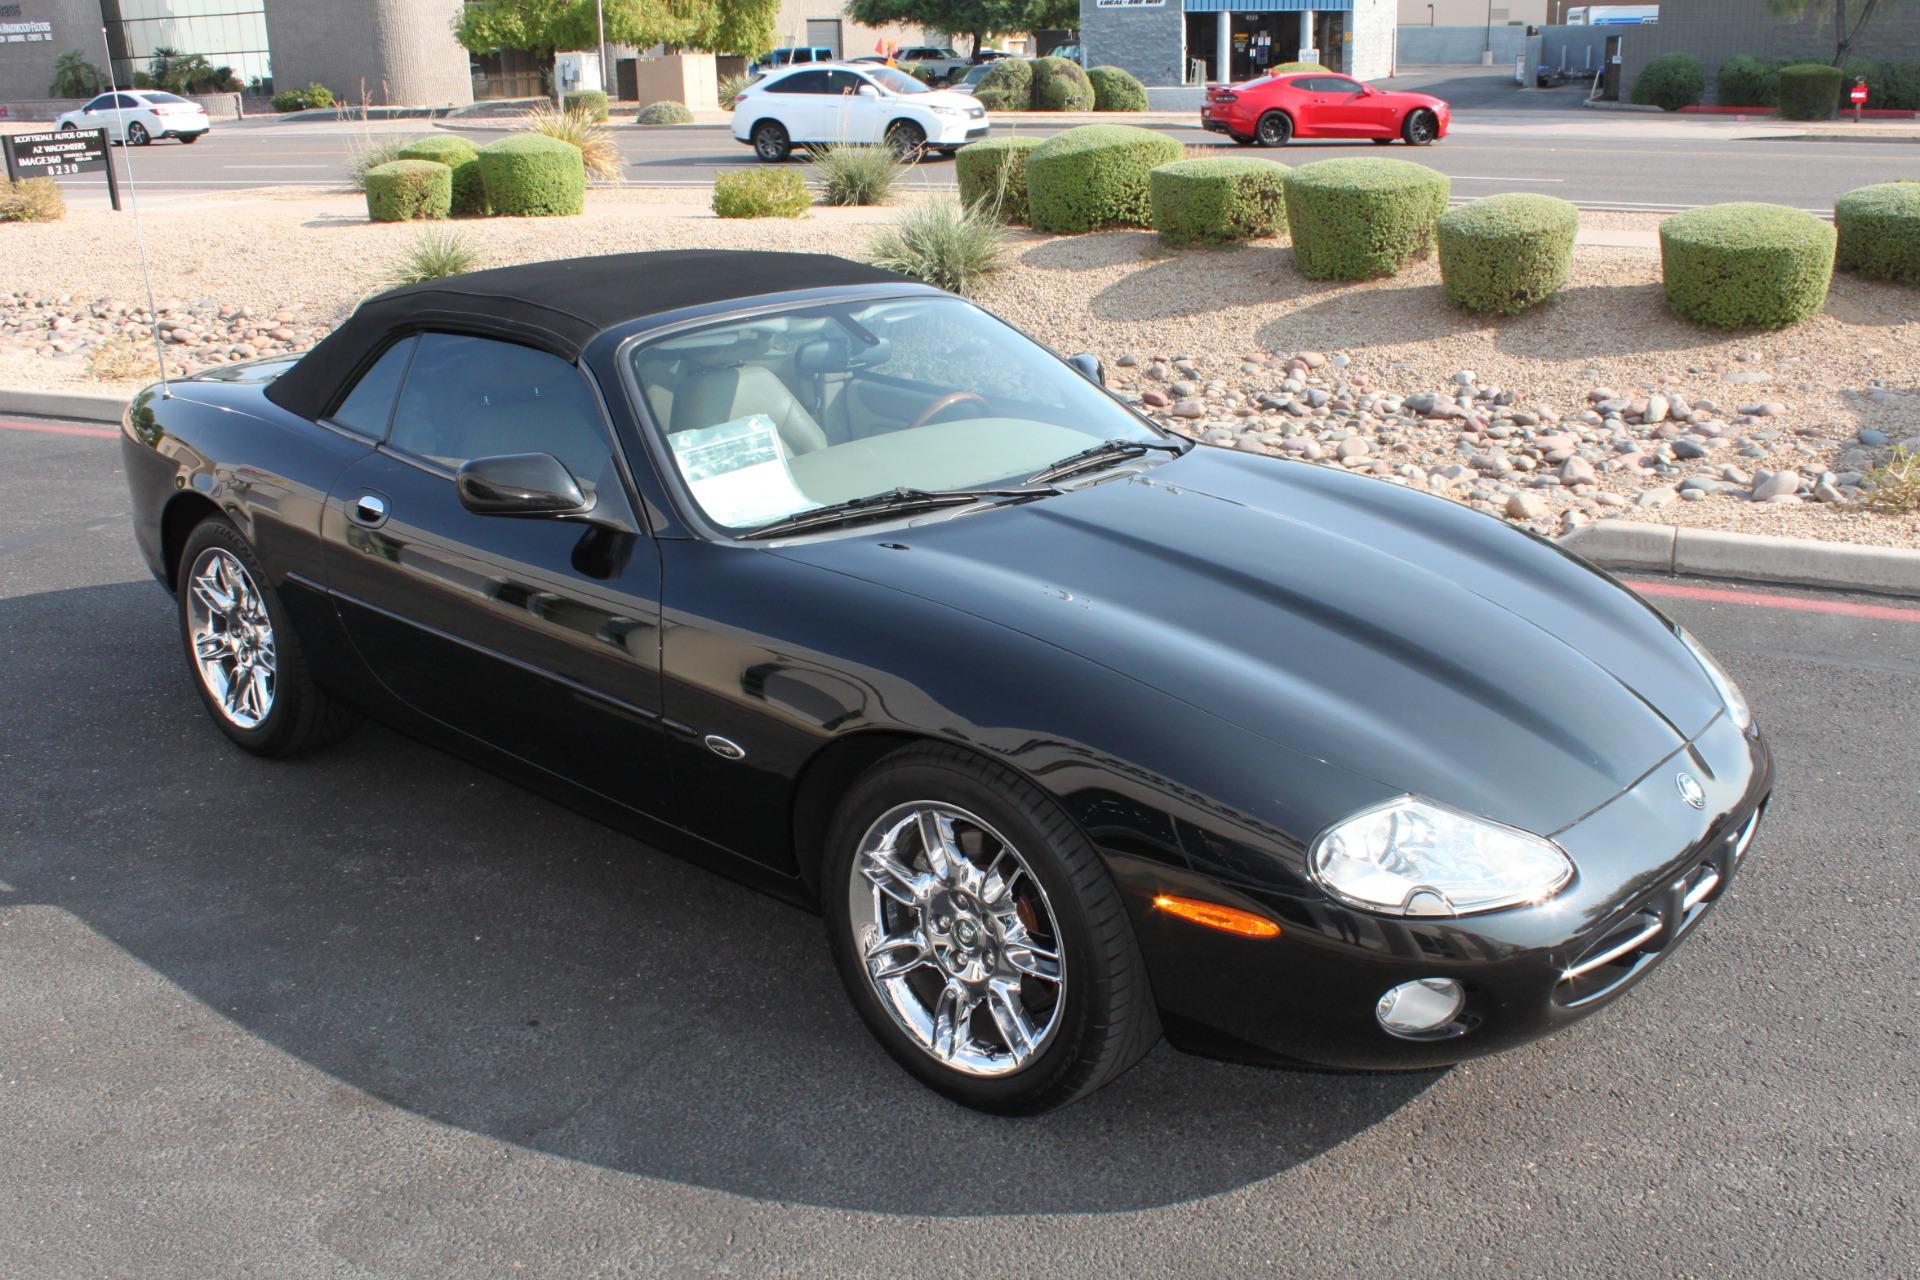 Used-2002-Jaguar-XK8-Convertible-XK8-Chevelle